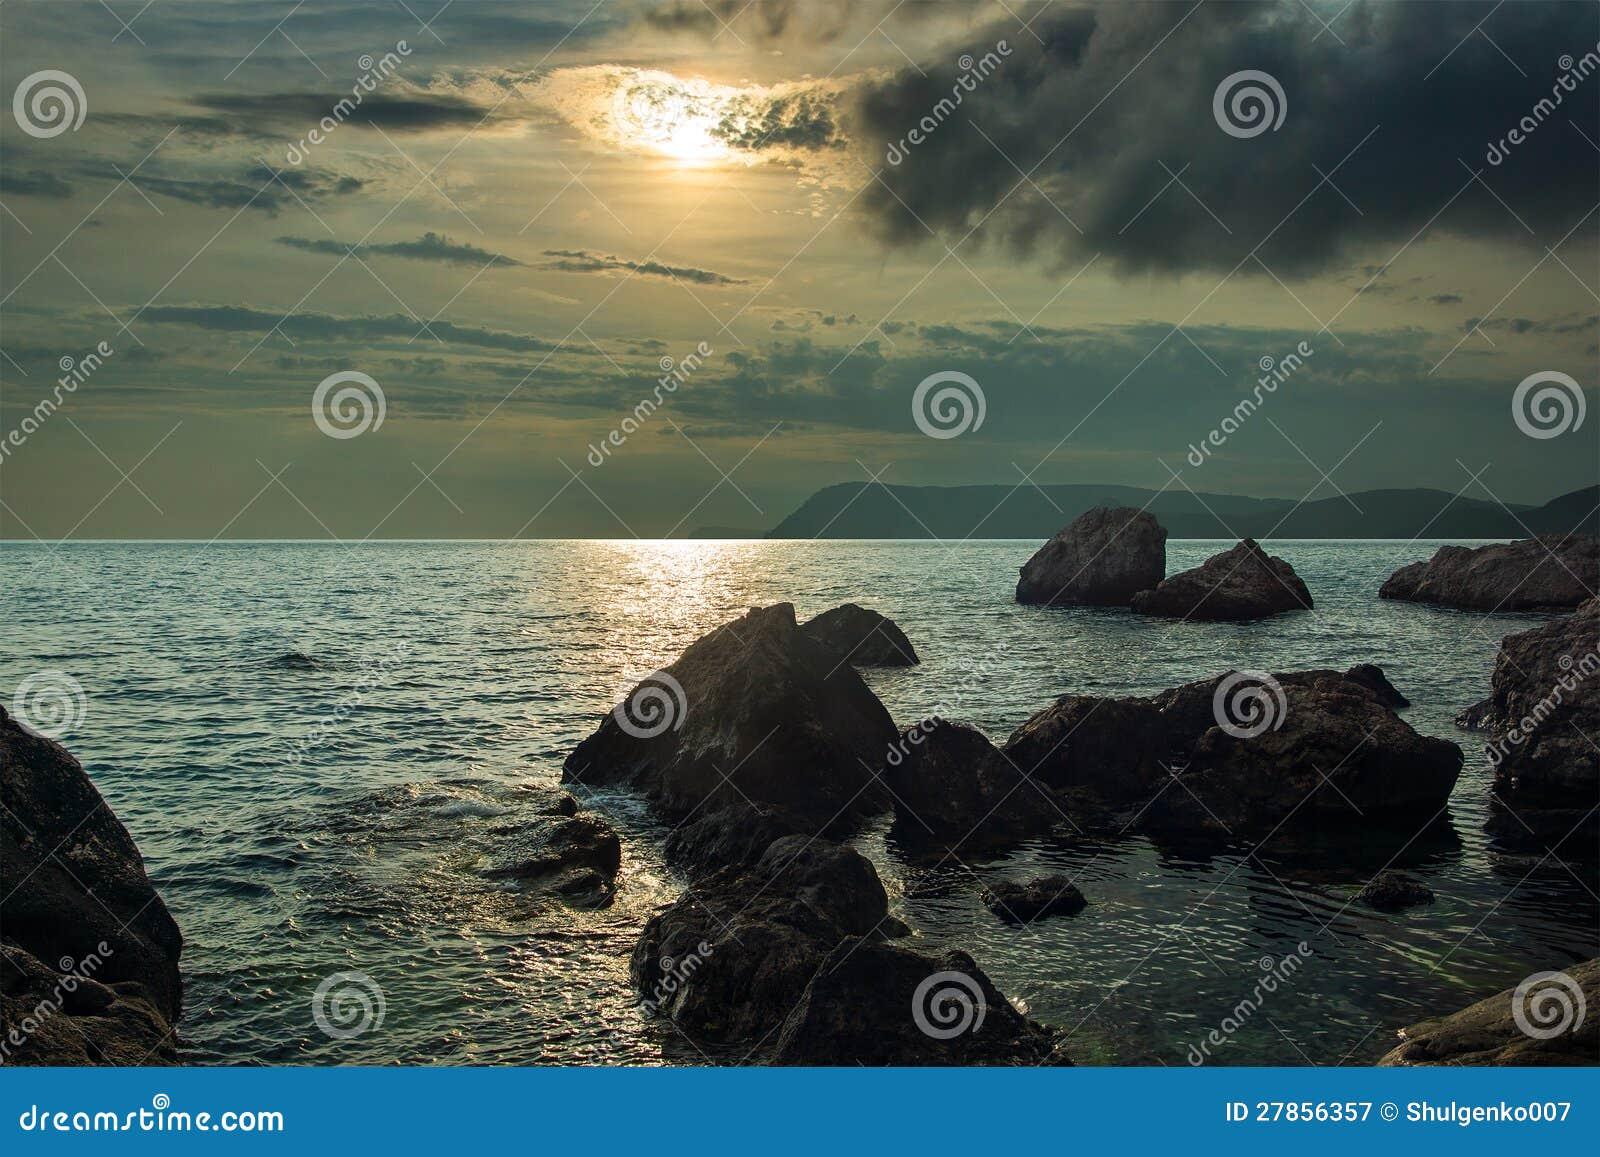 Piękny spokojny zmierzch na Czarnym morzu,